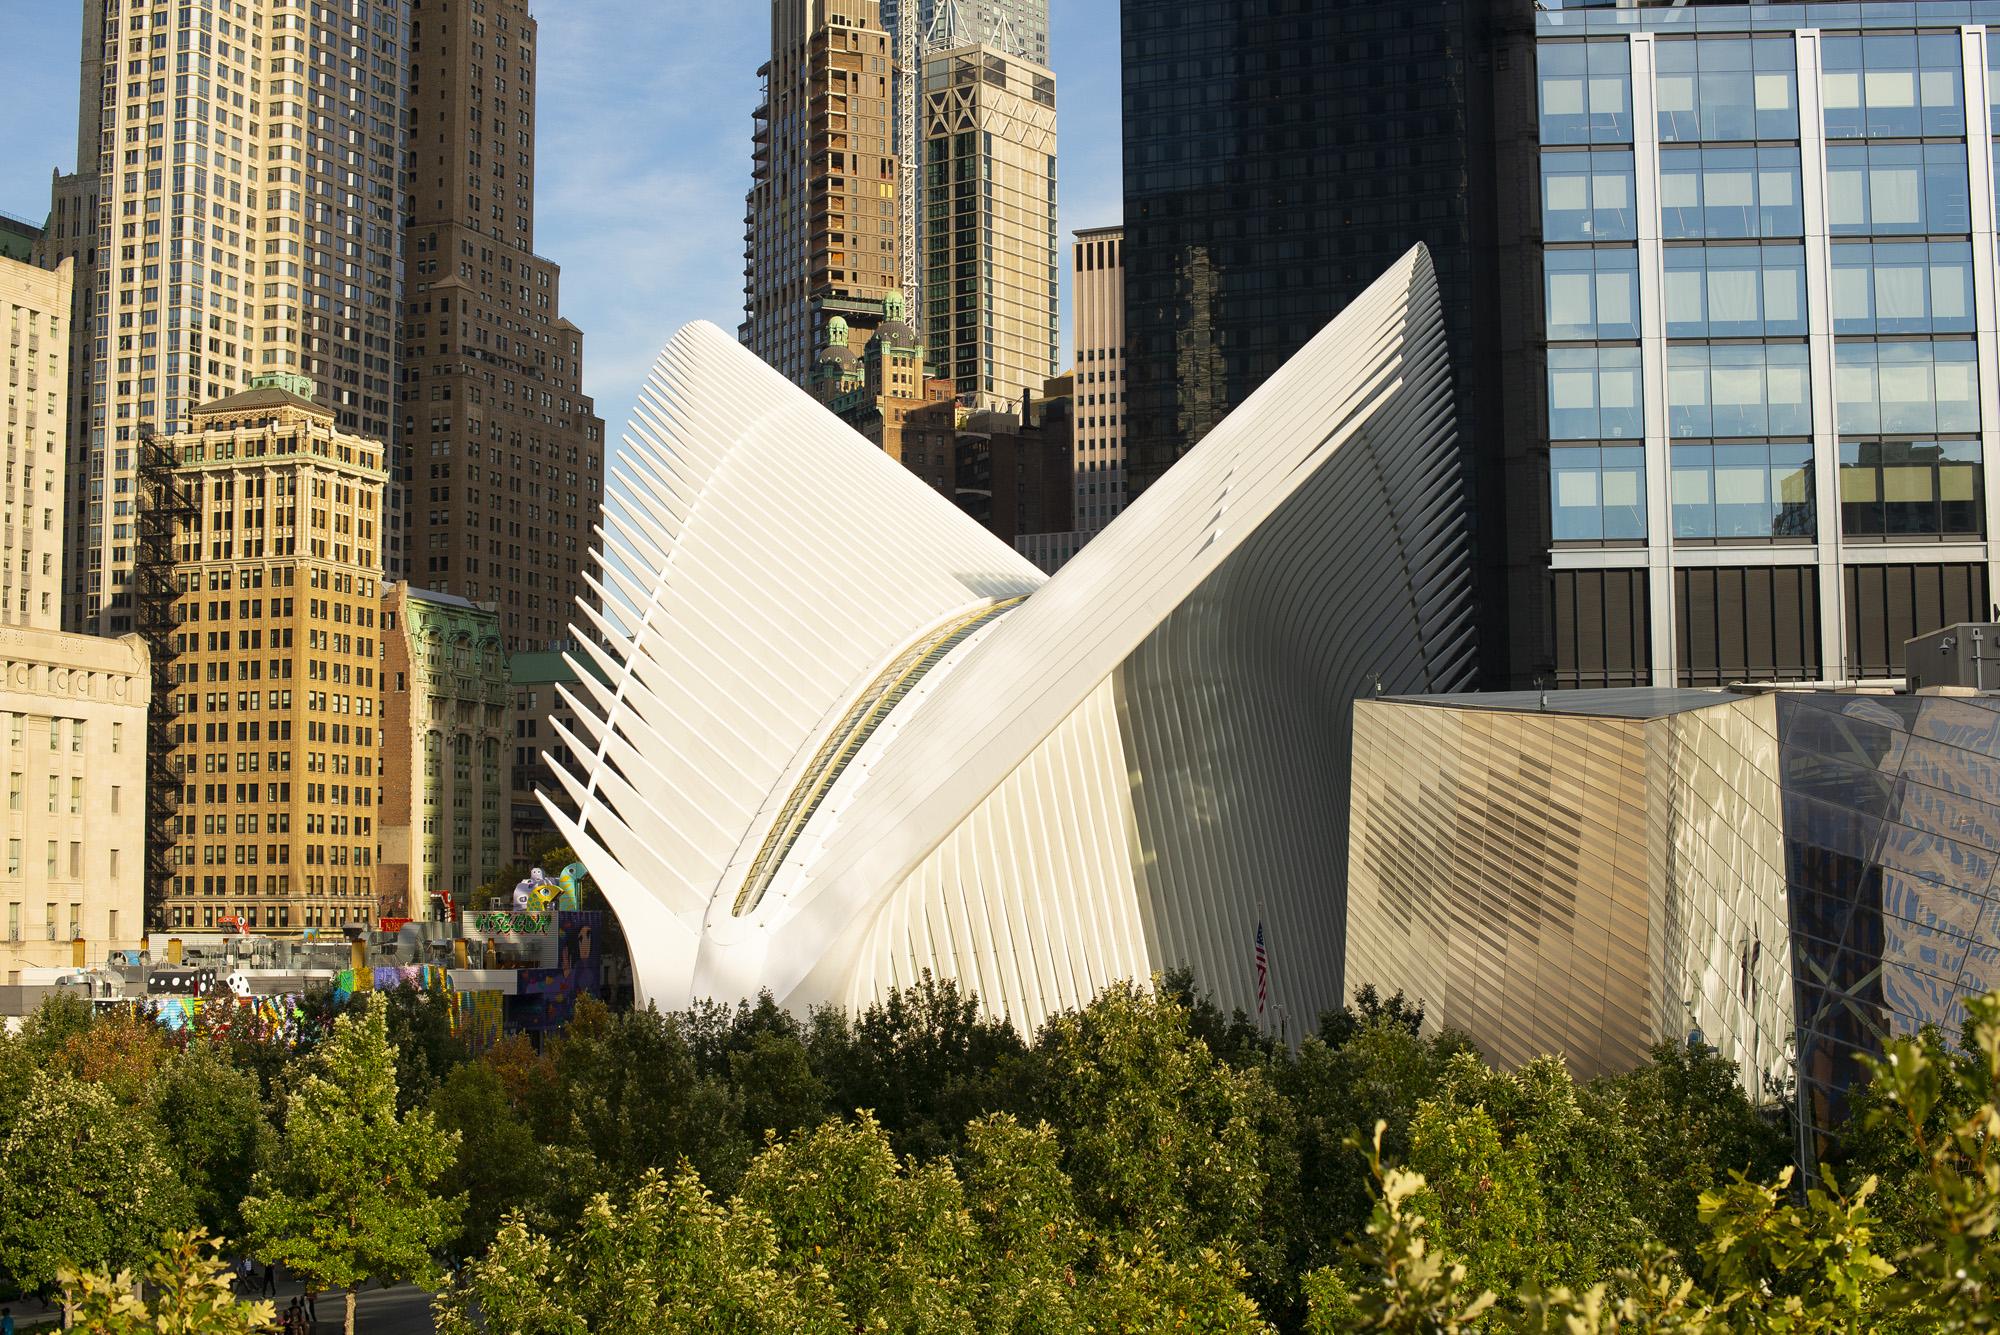 Make Music New York 2021 @World Trade Center Oculus, New York City!